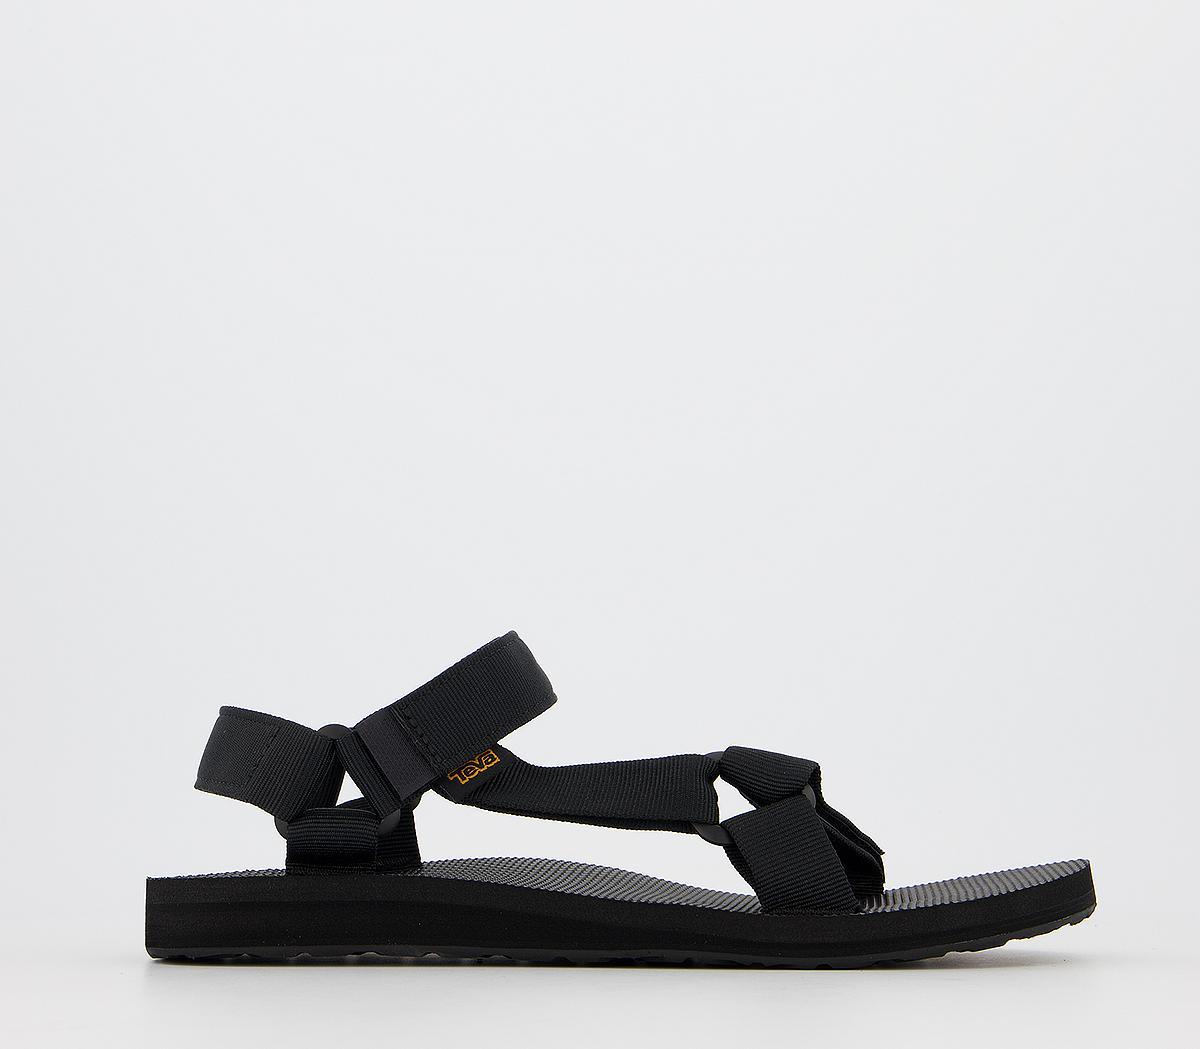 Original Universal Urban Sandals